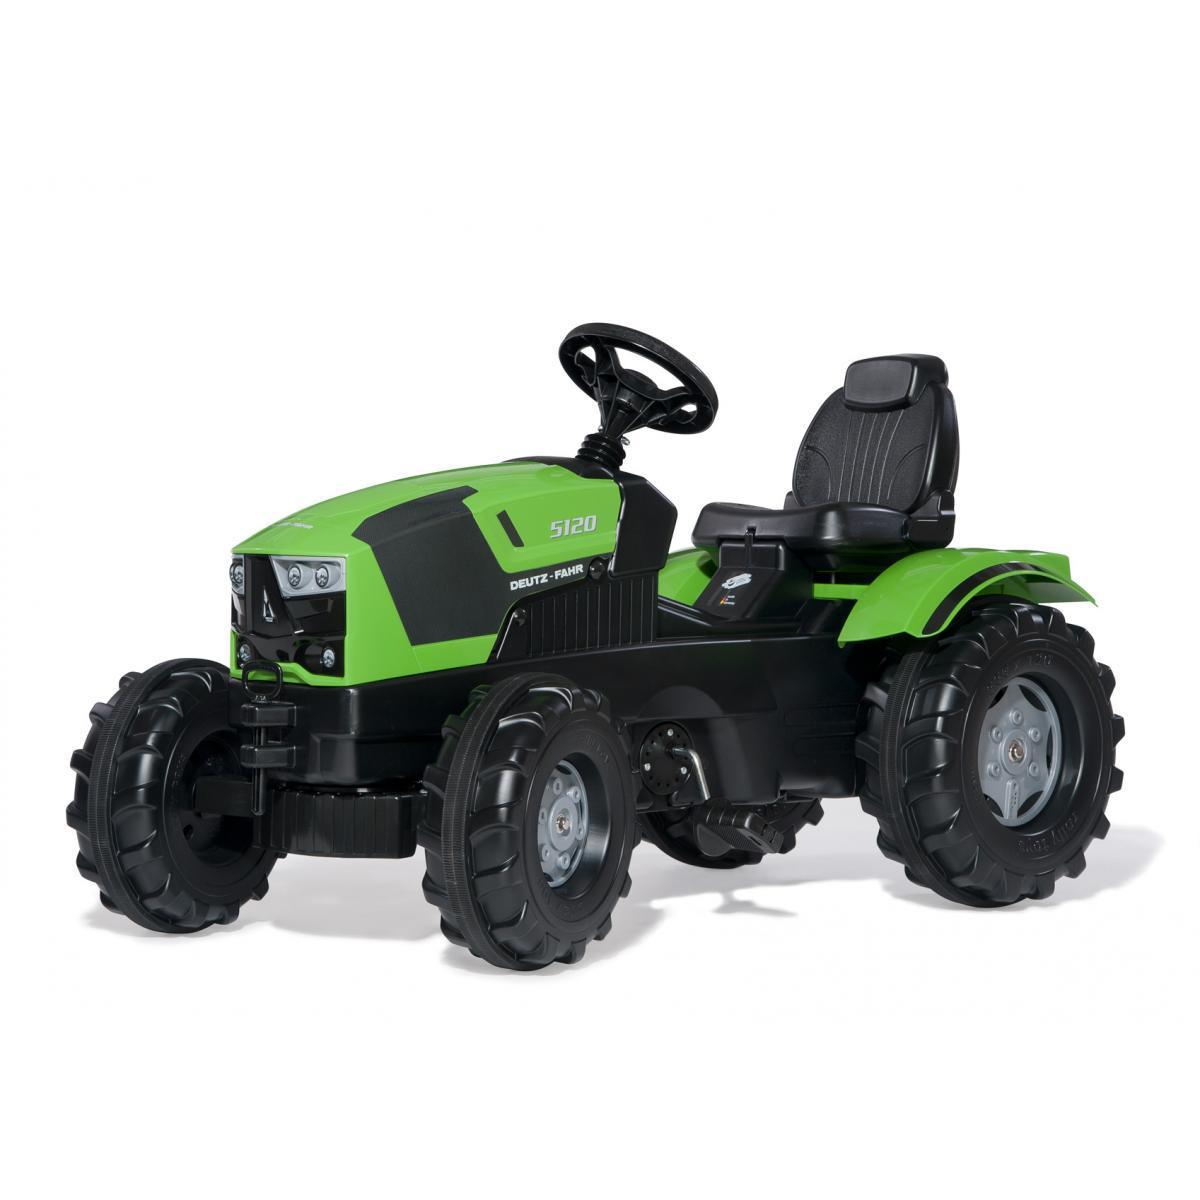 Rolly Toys Rolly Toys Tracteur a Pedales rollyFarmtrac Deutz-Fahr 5120